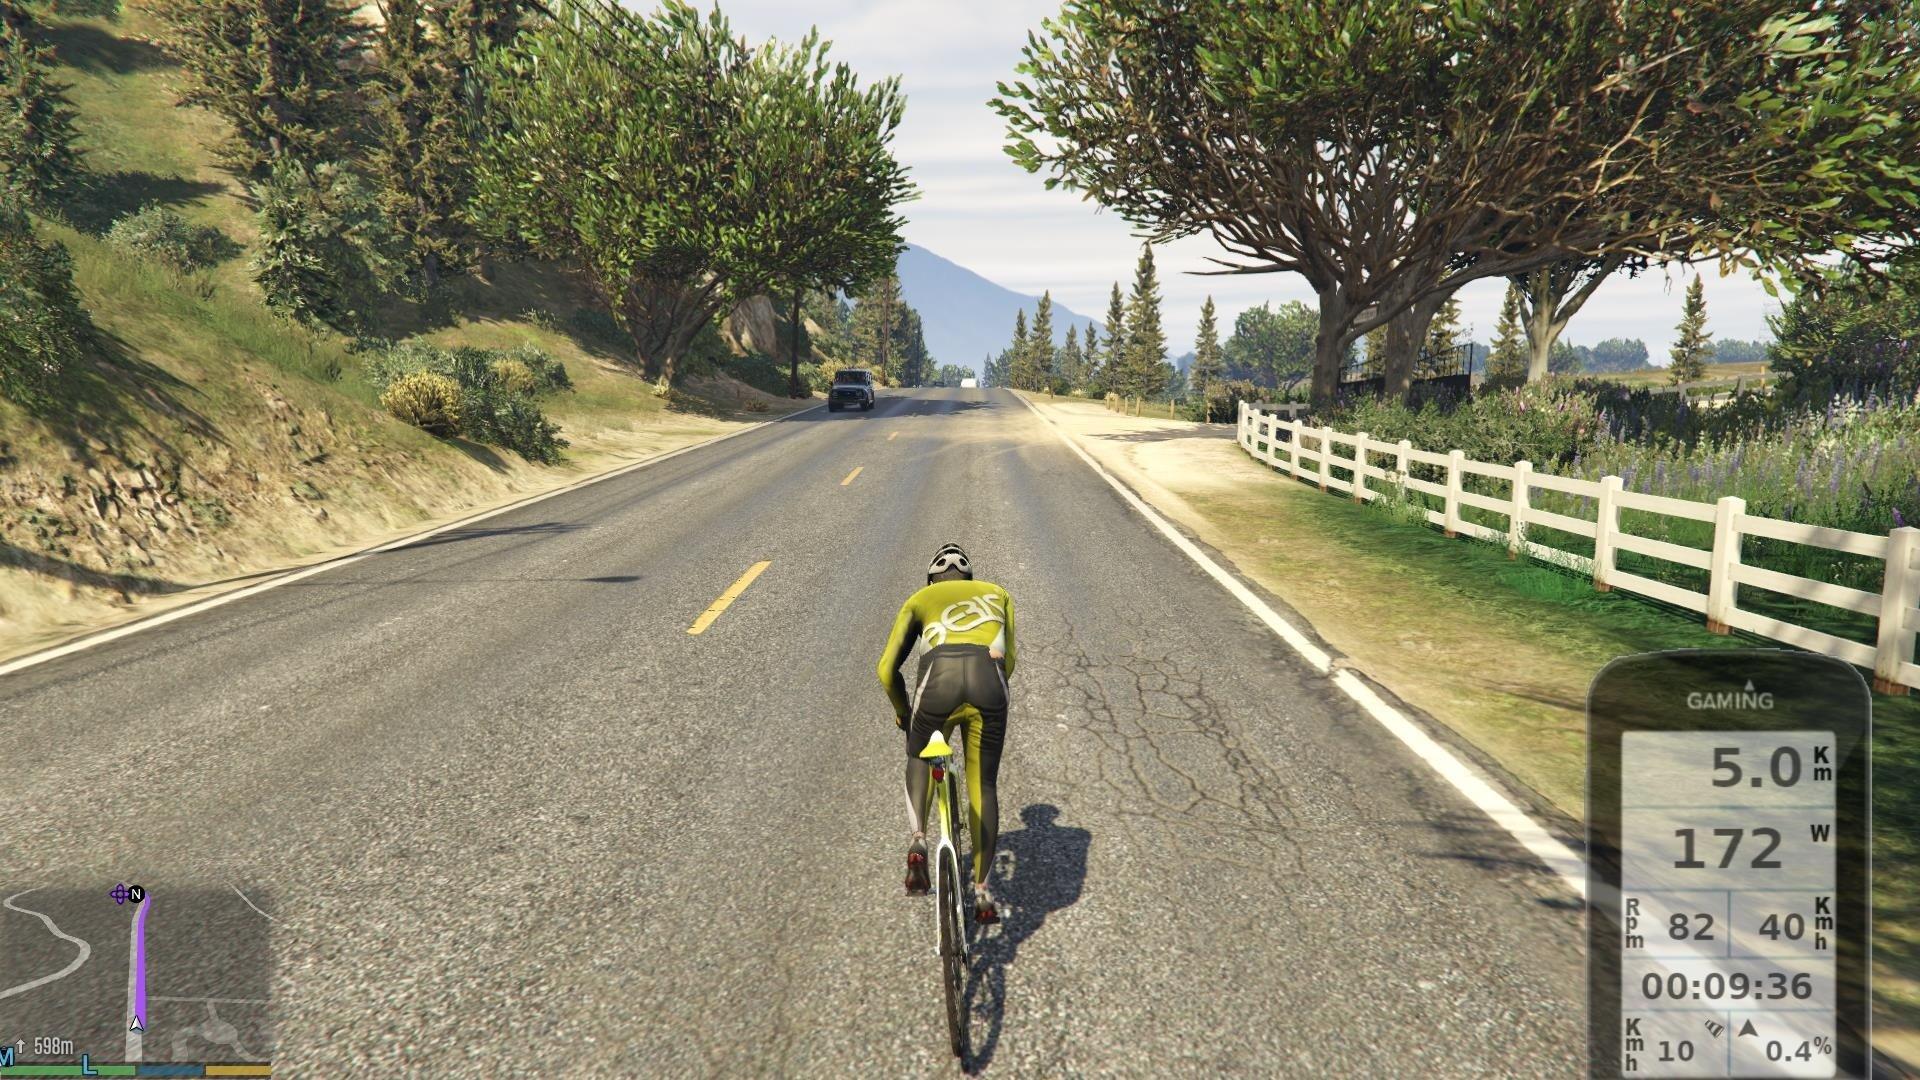 gta v, gaming, mod, cycling, zwift, virtual, indoors, training